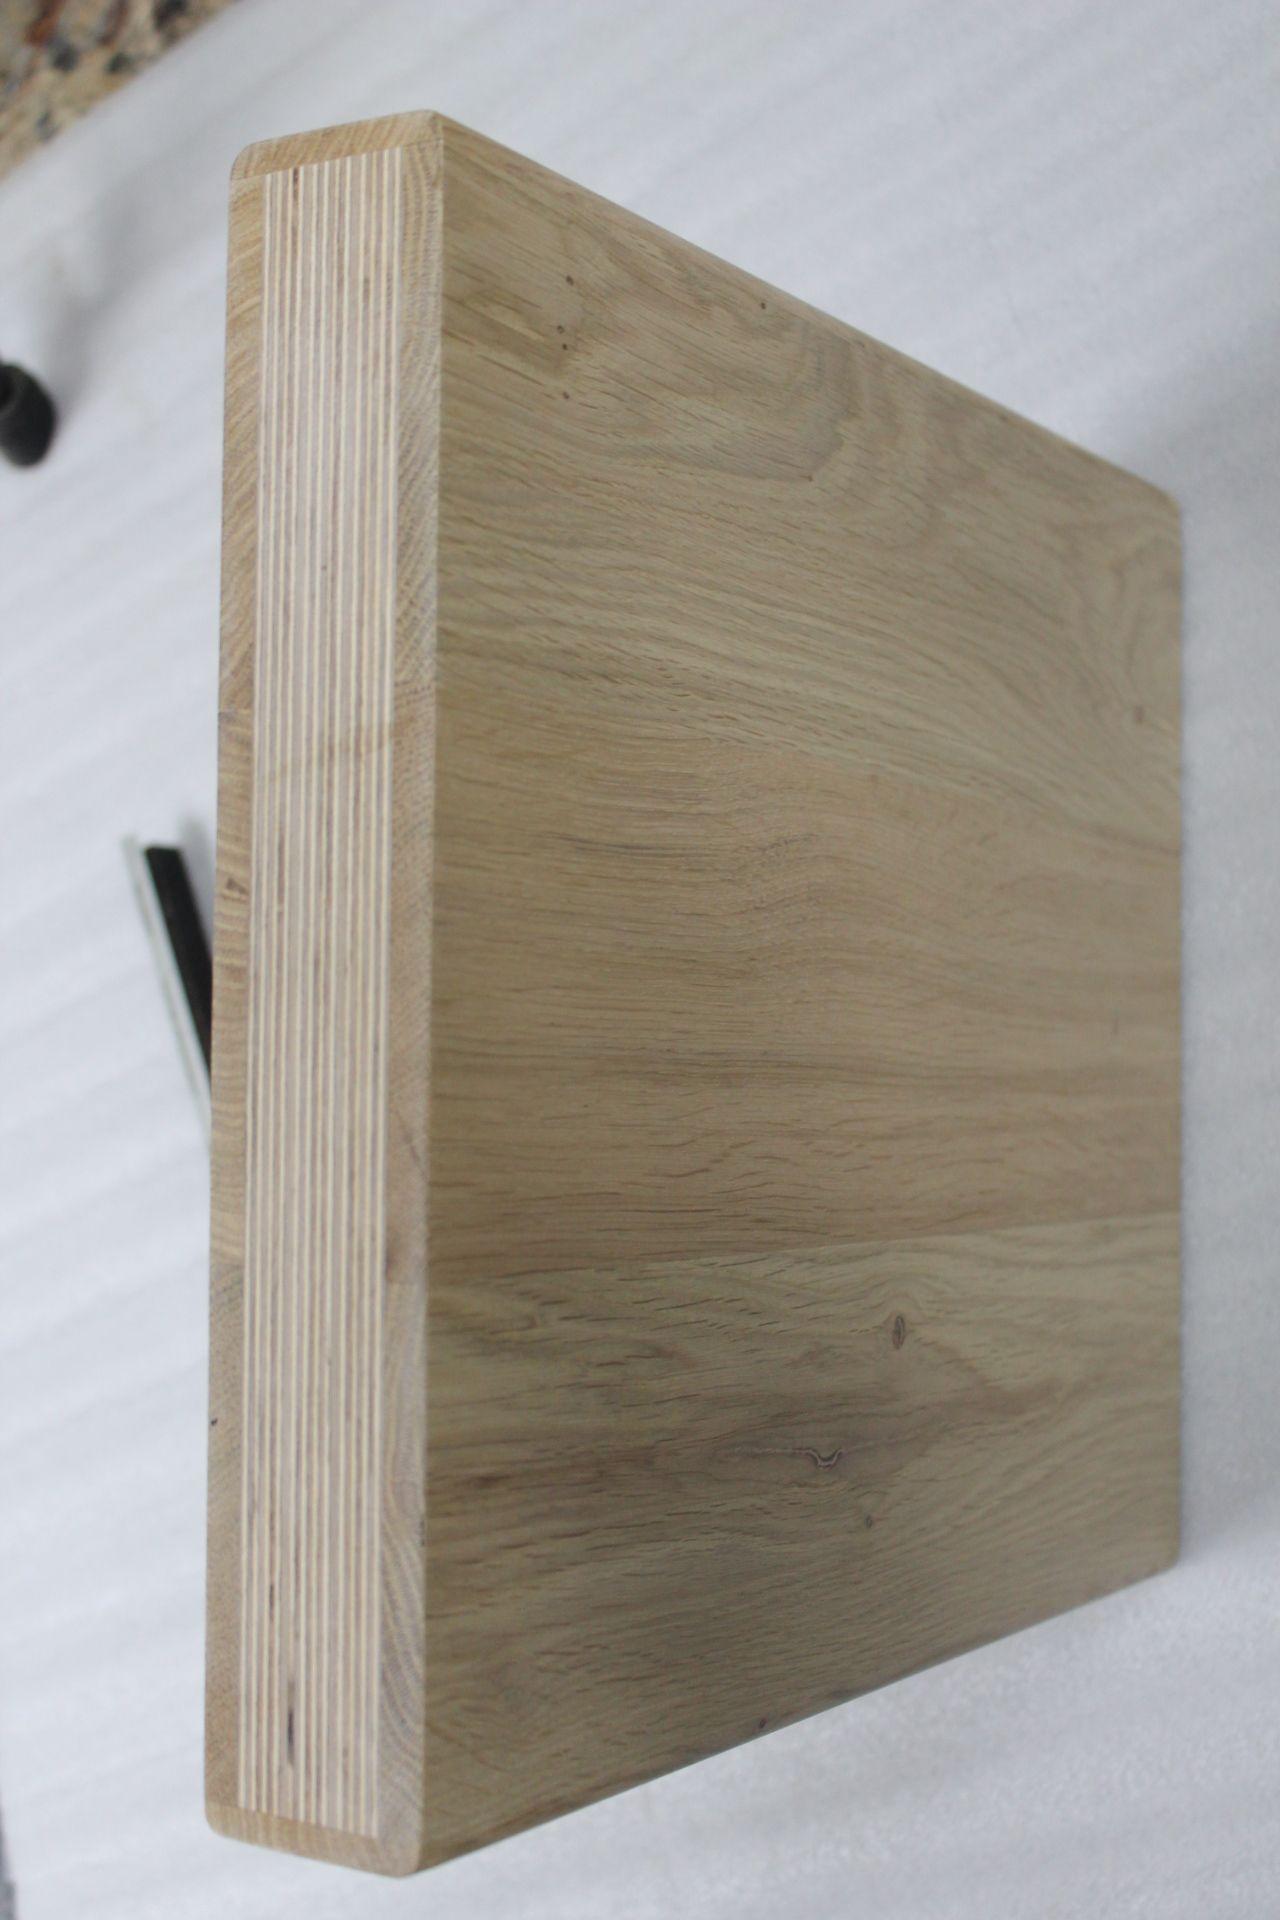 Best European Oak Engineered Tread Decor Home Decor 640 x 480